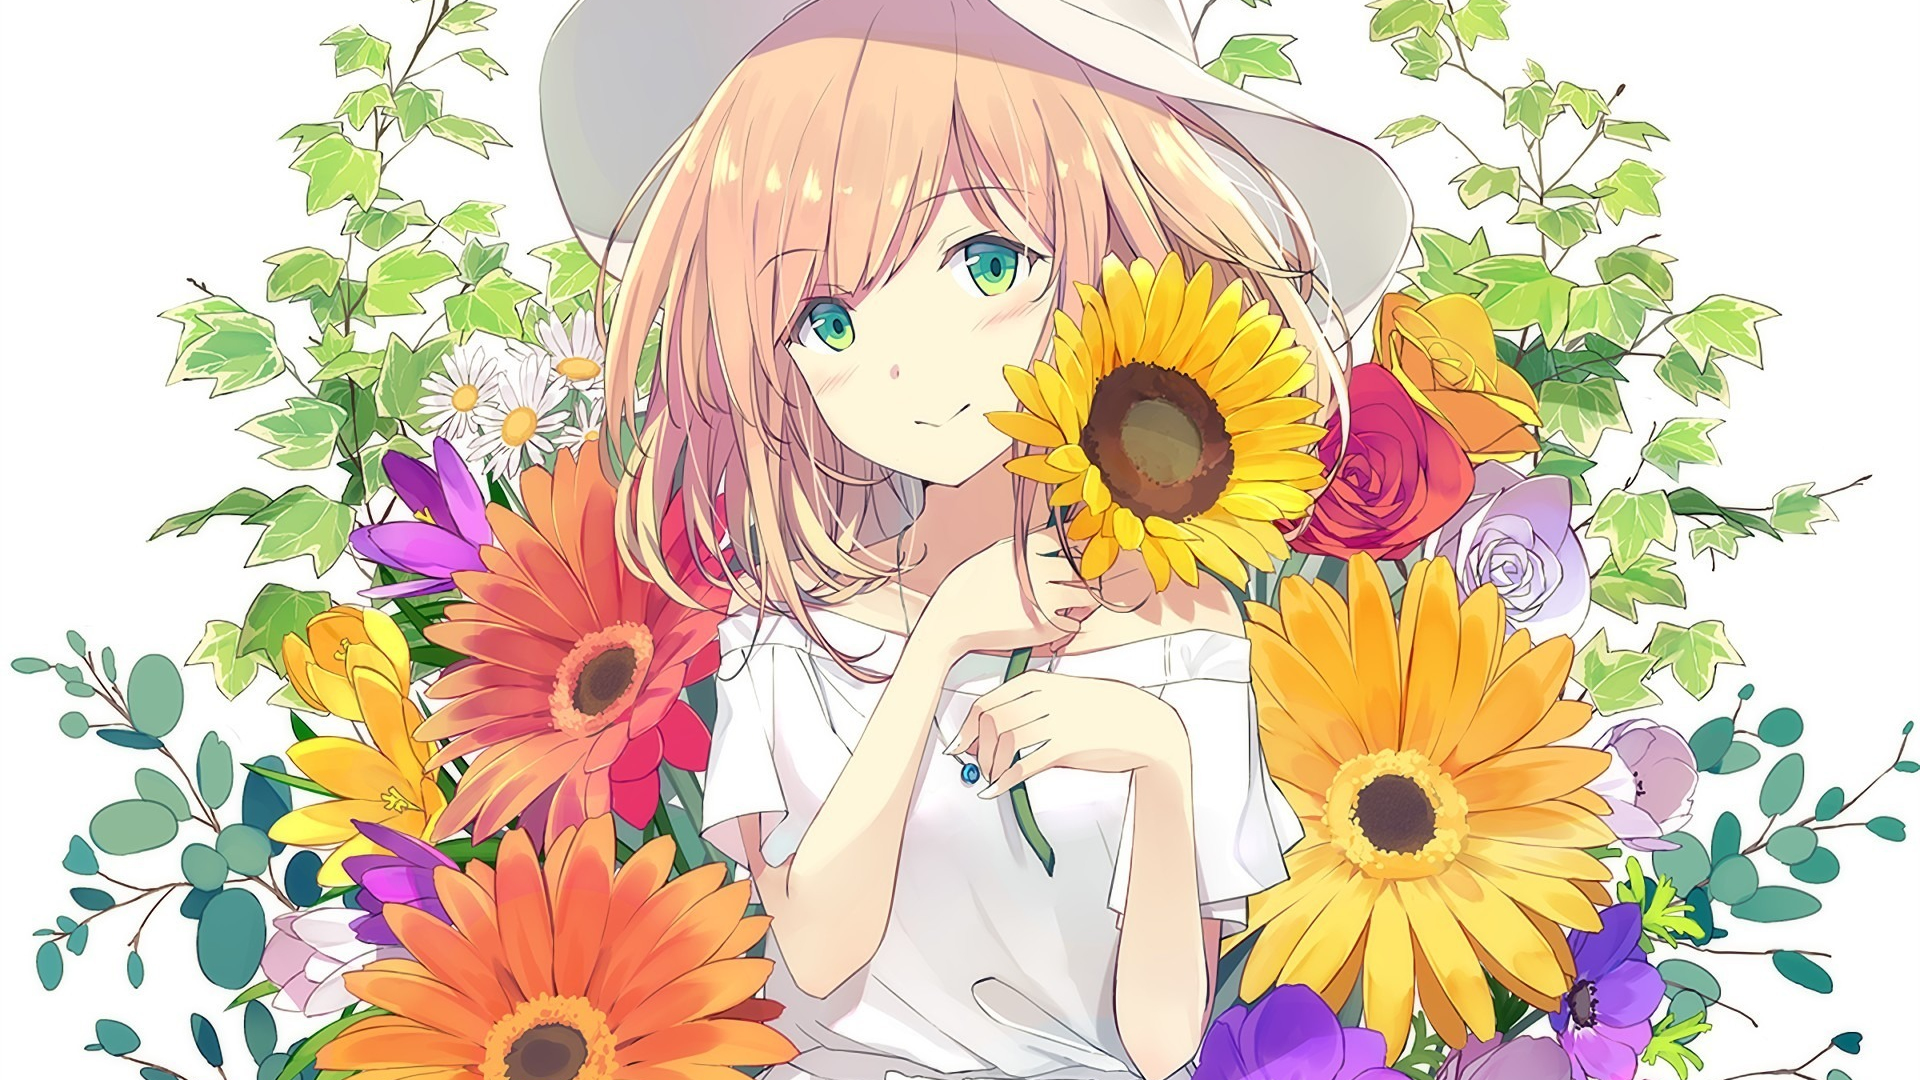 download 1920x1080 wallpaper cute anime girl flowers full hd